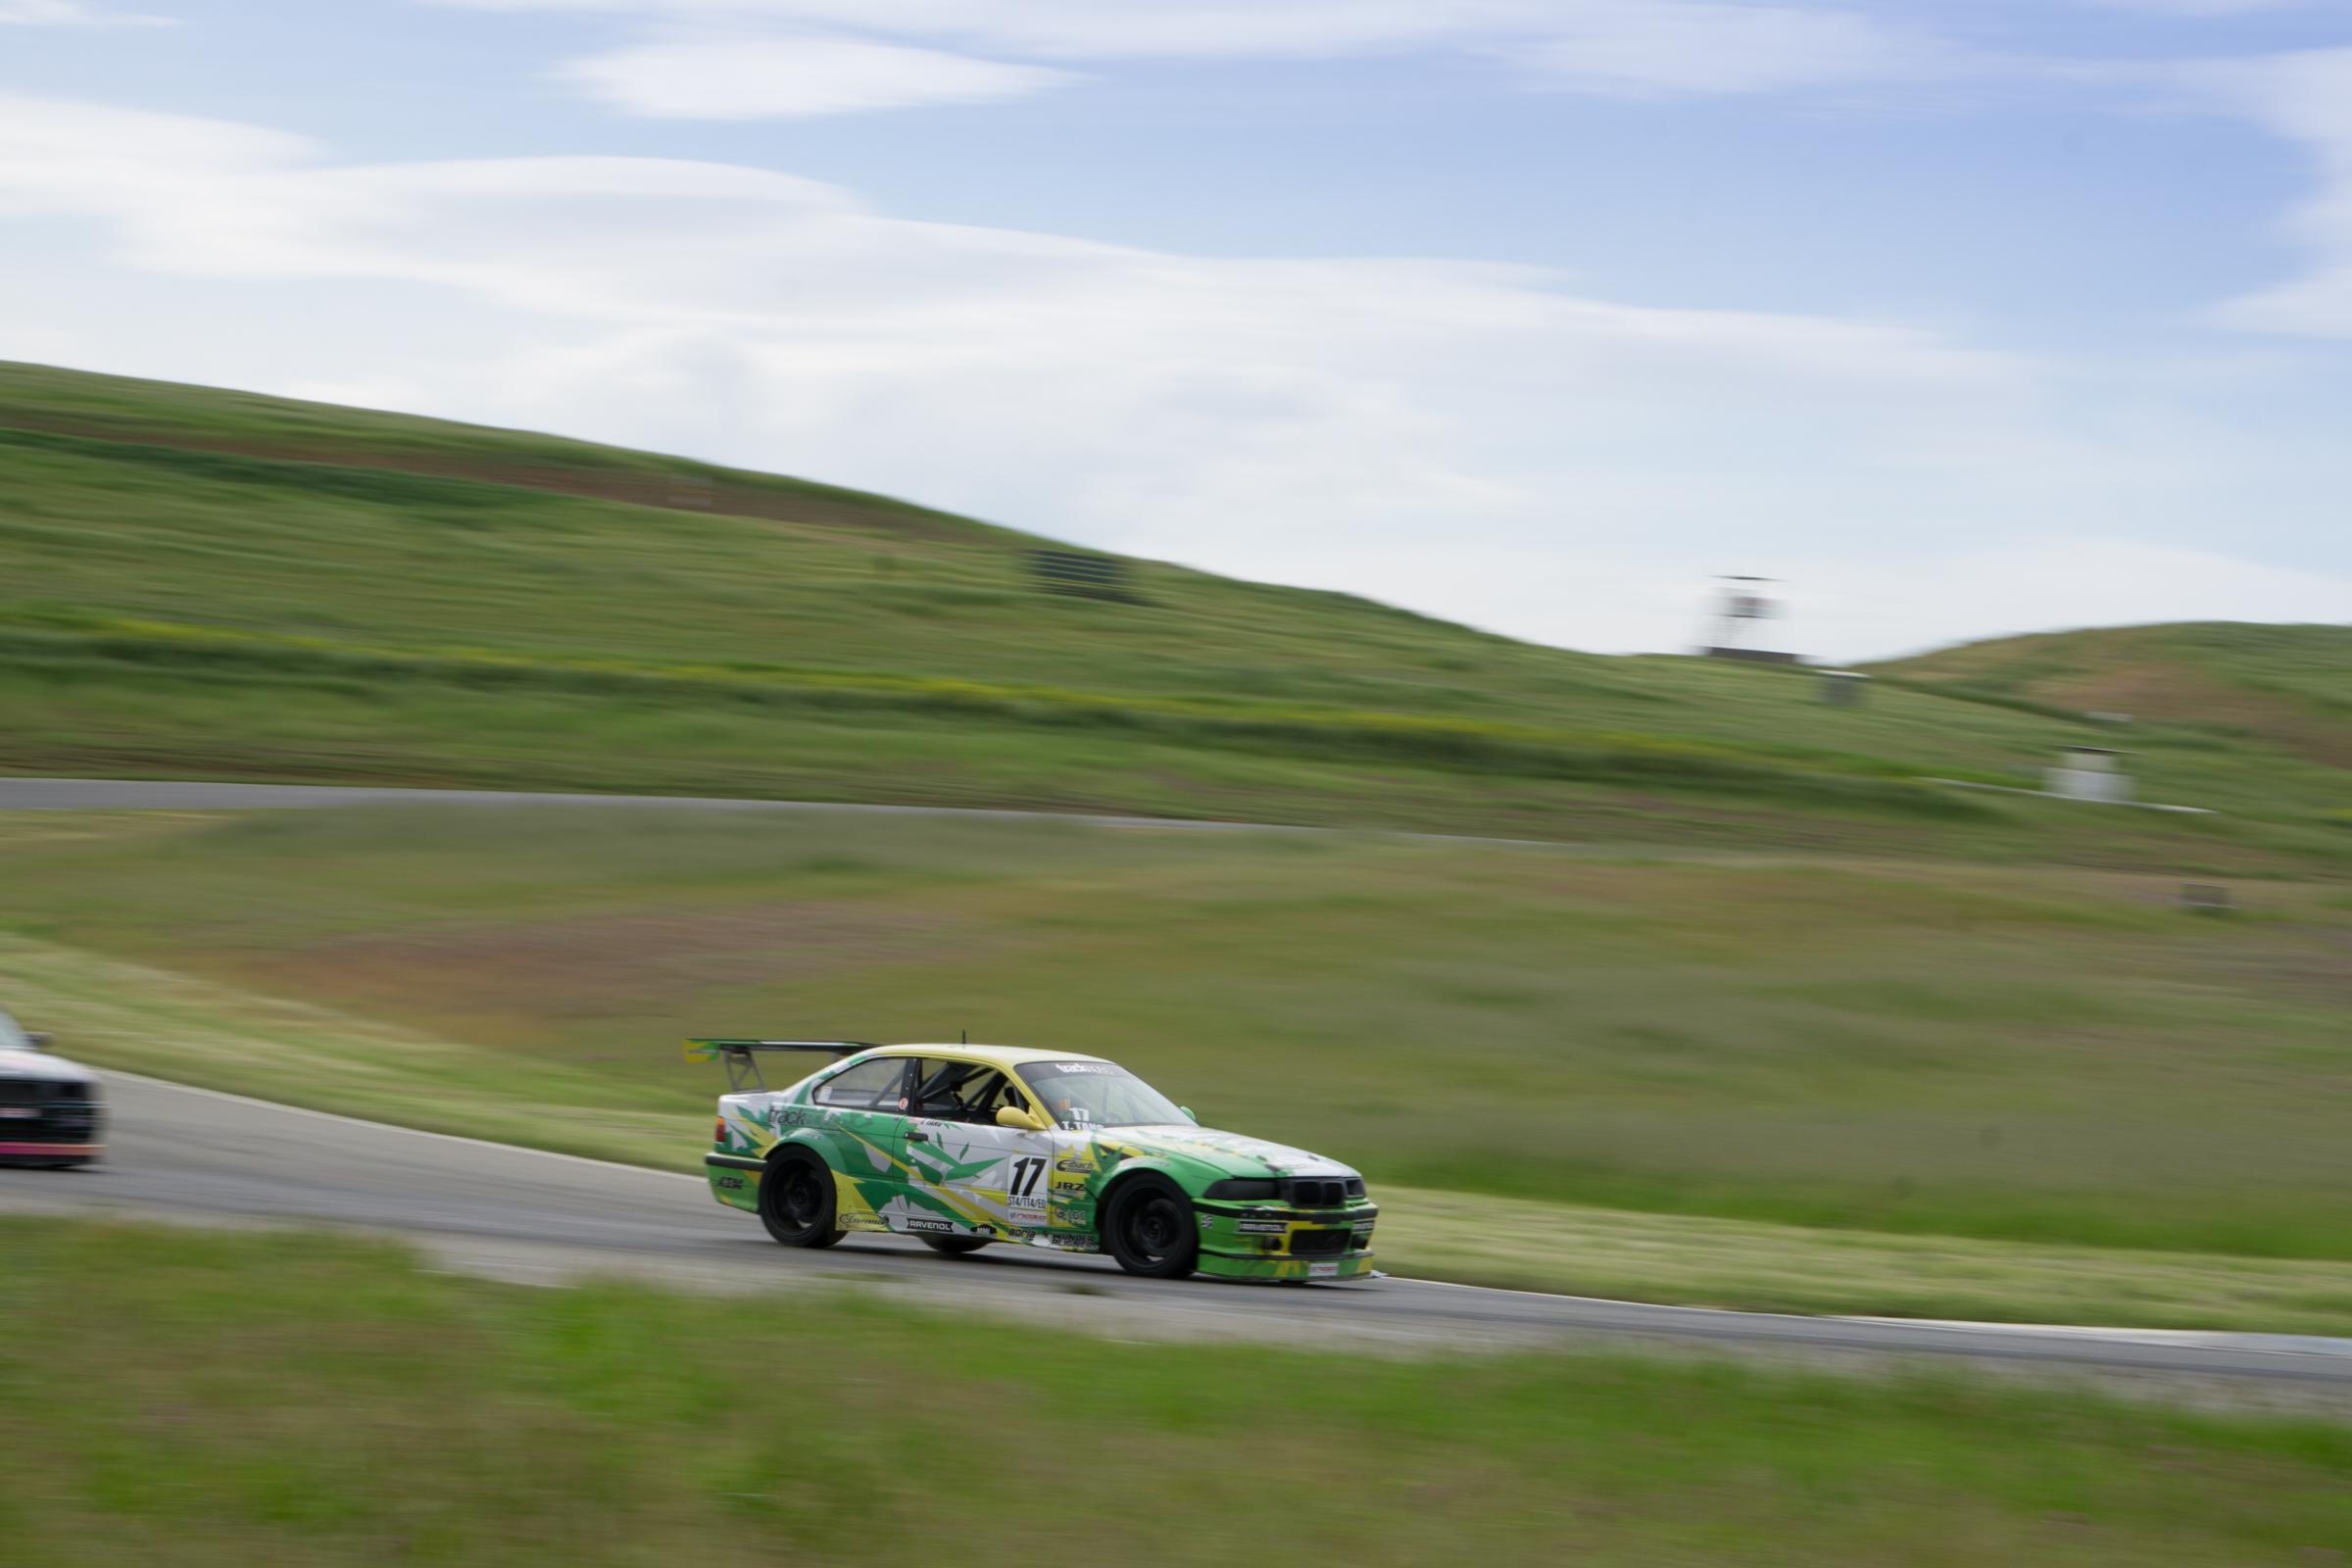 Tom Tang E36 M3 Thunderhill Raceway